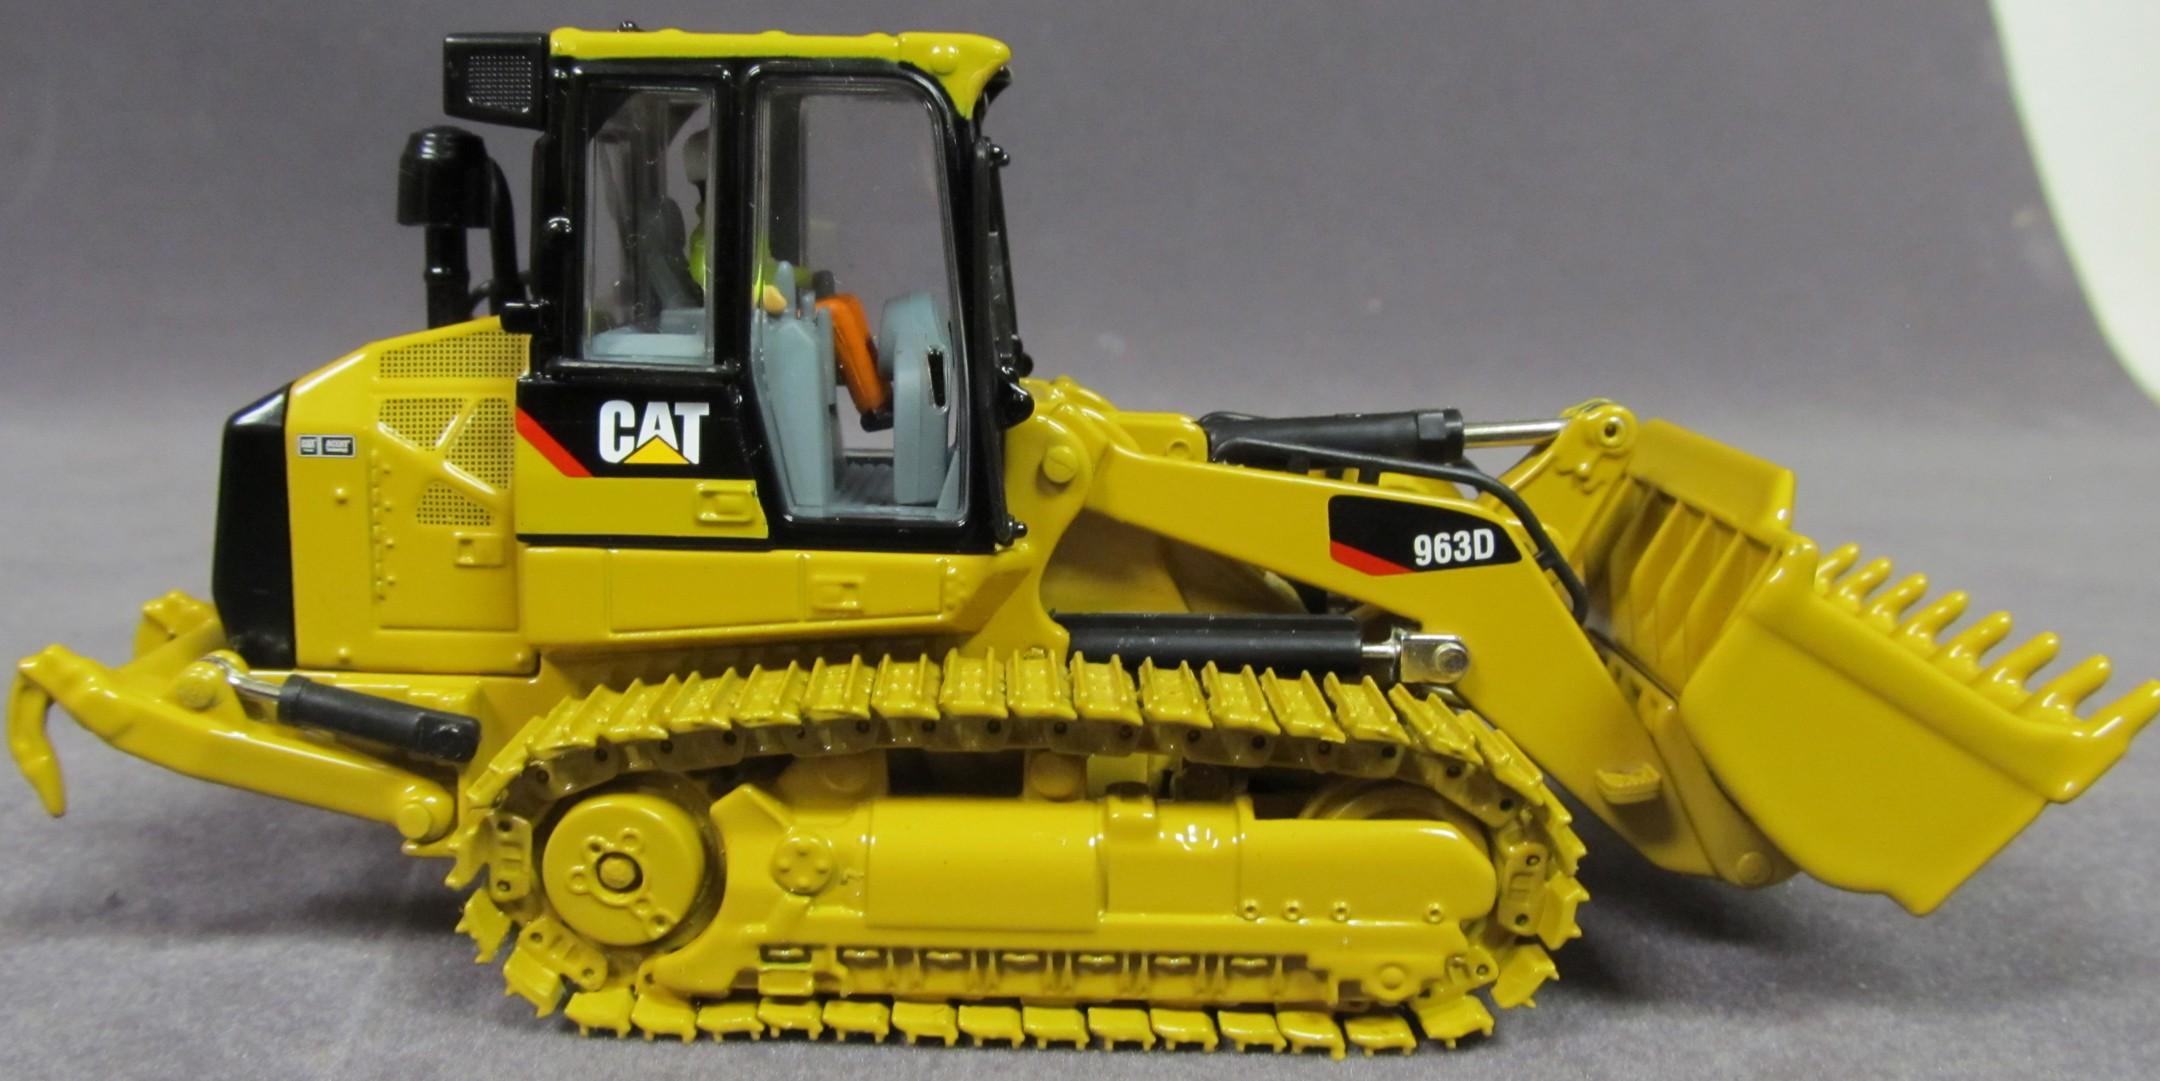 Caterpillar 963D Track Loader